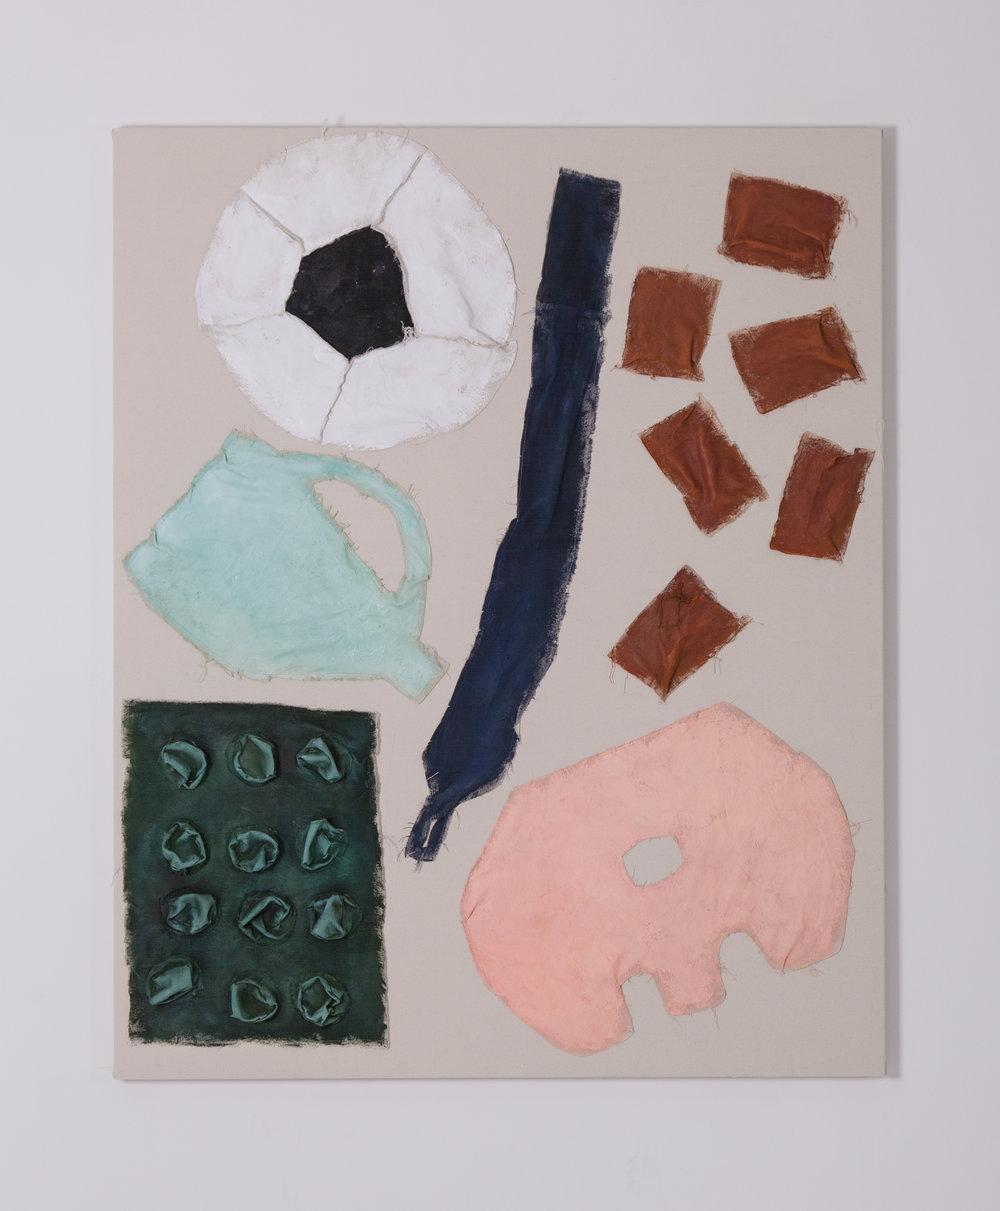 Football, Sponges, Egg Carton, Fruit Liner, Duster_Oil and Acrylic on Canvas | 110 x 138 cm | Oil and Acrylic on Canvas